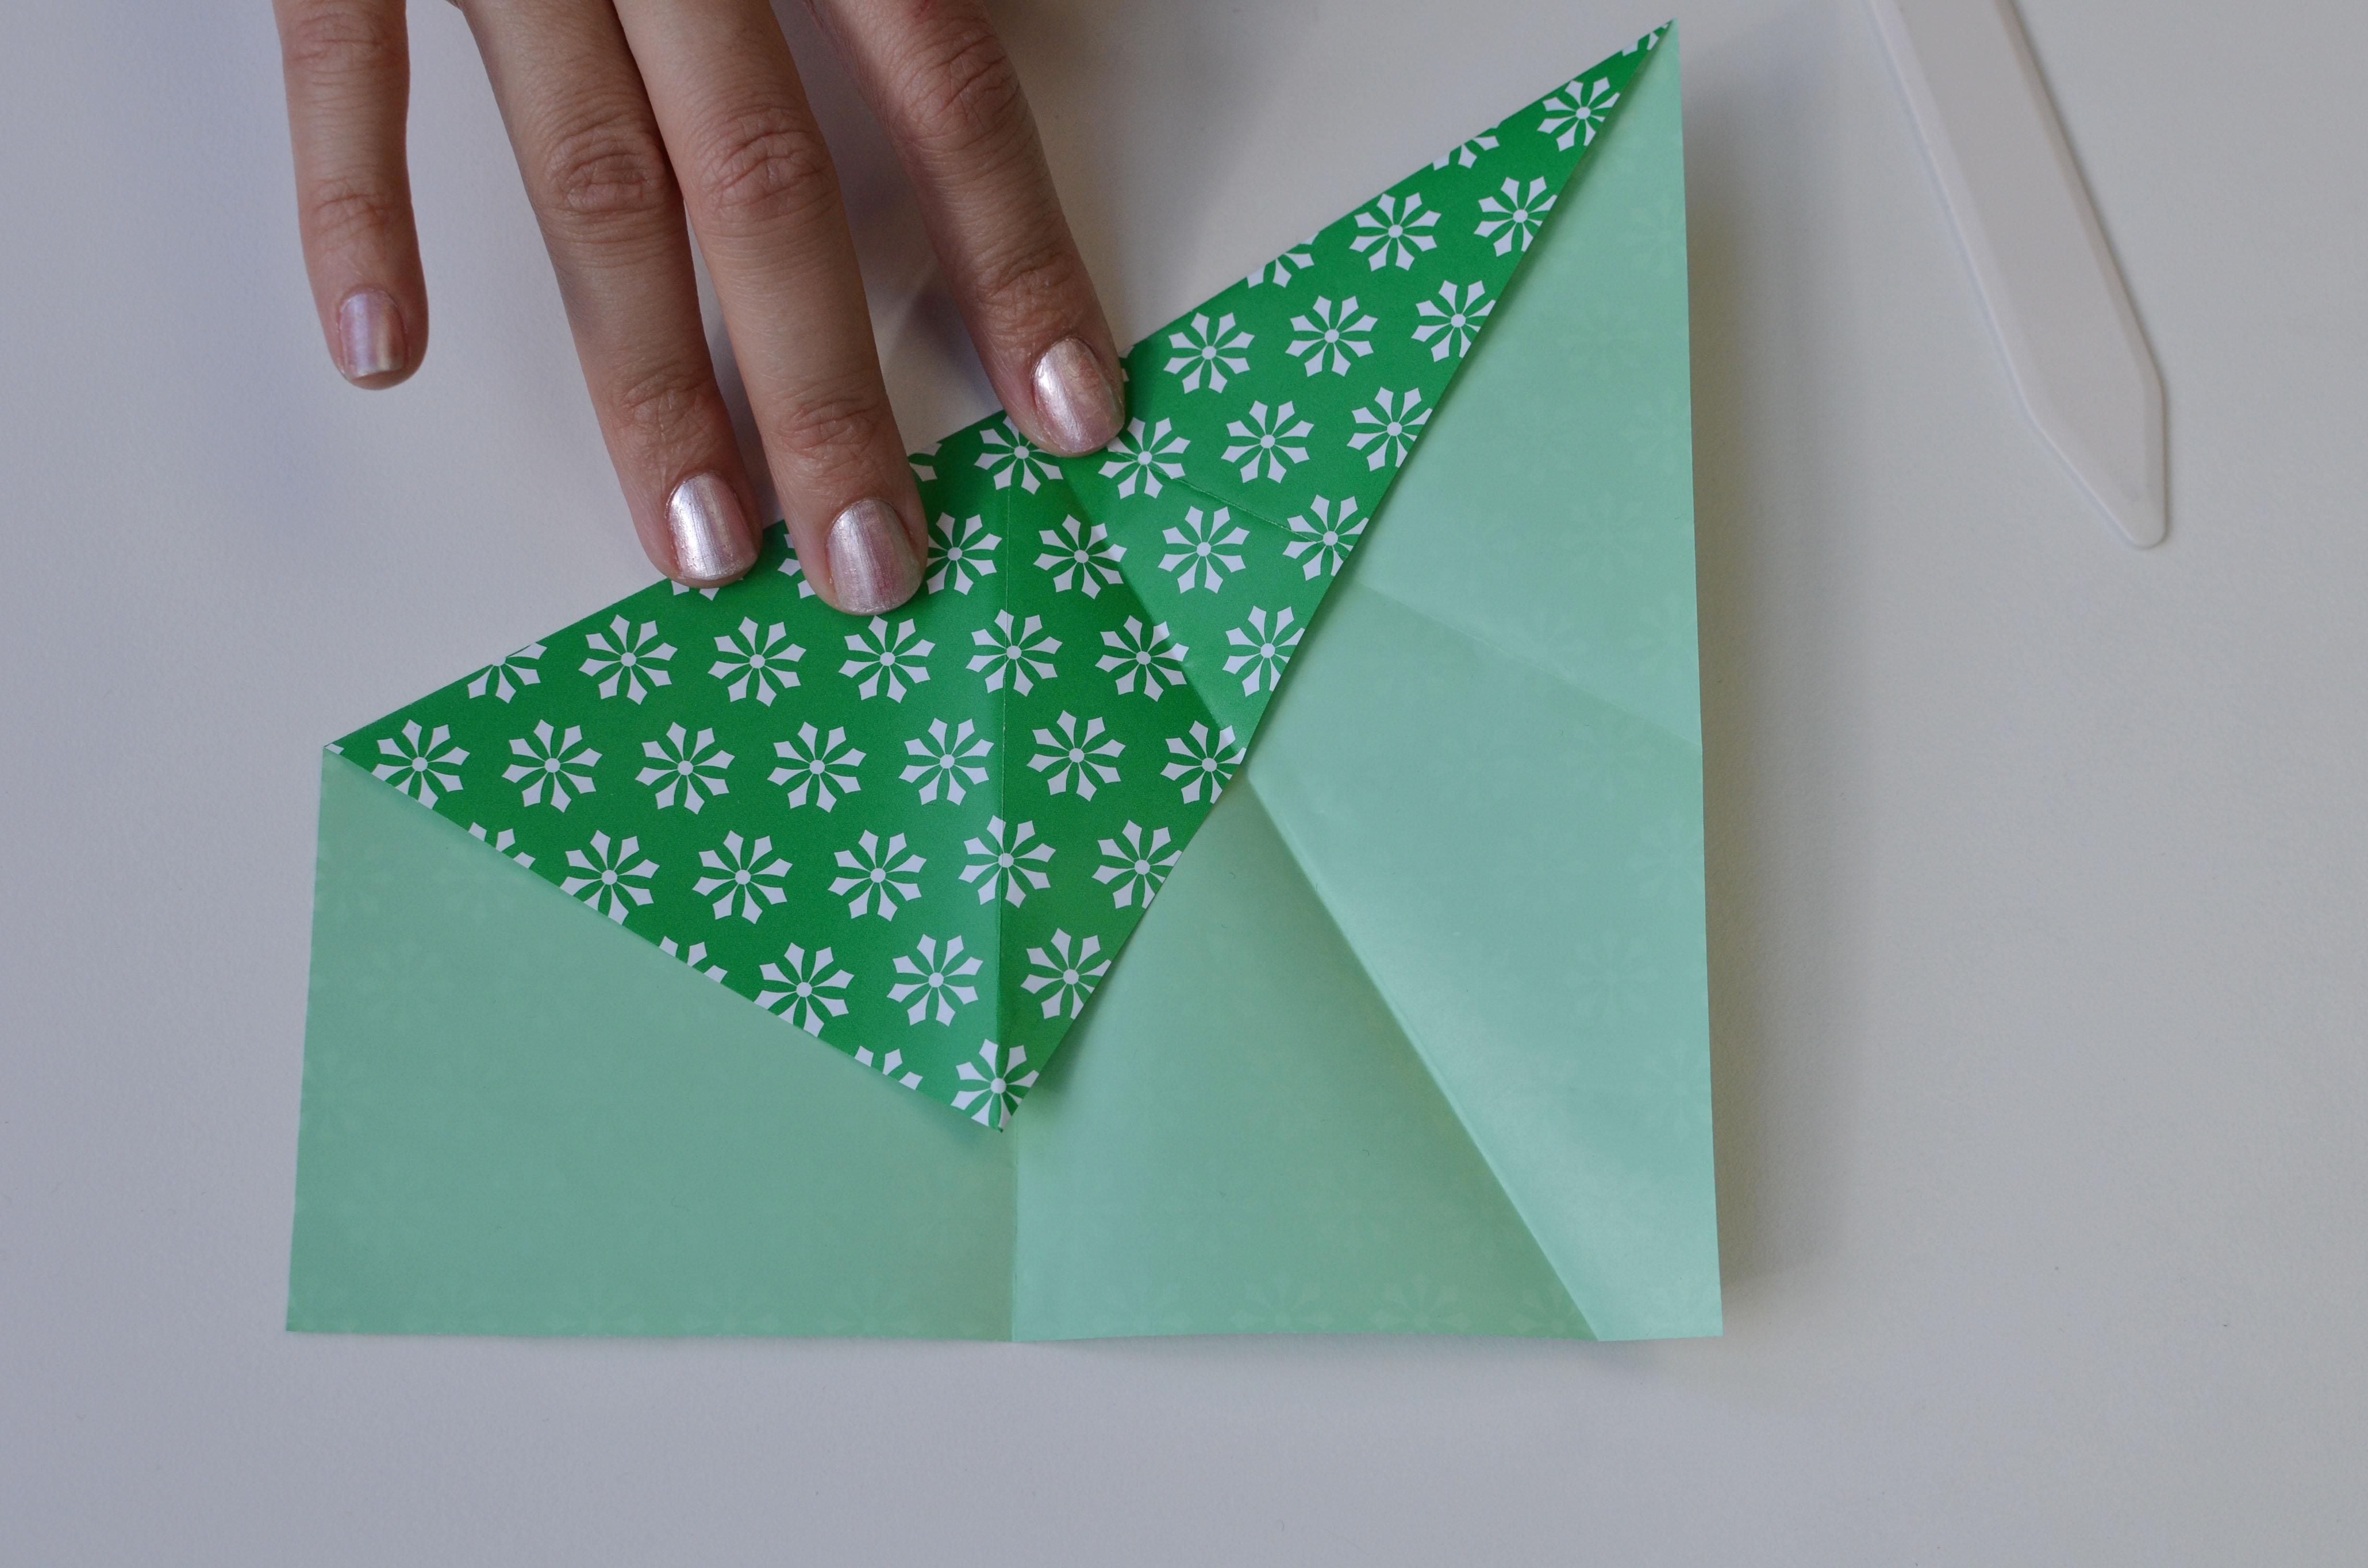 braincrafts_frog_origami_pt10.jpg